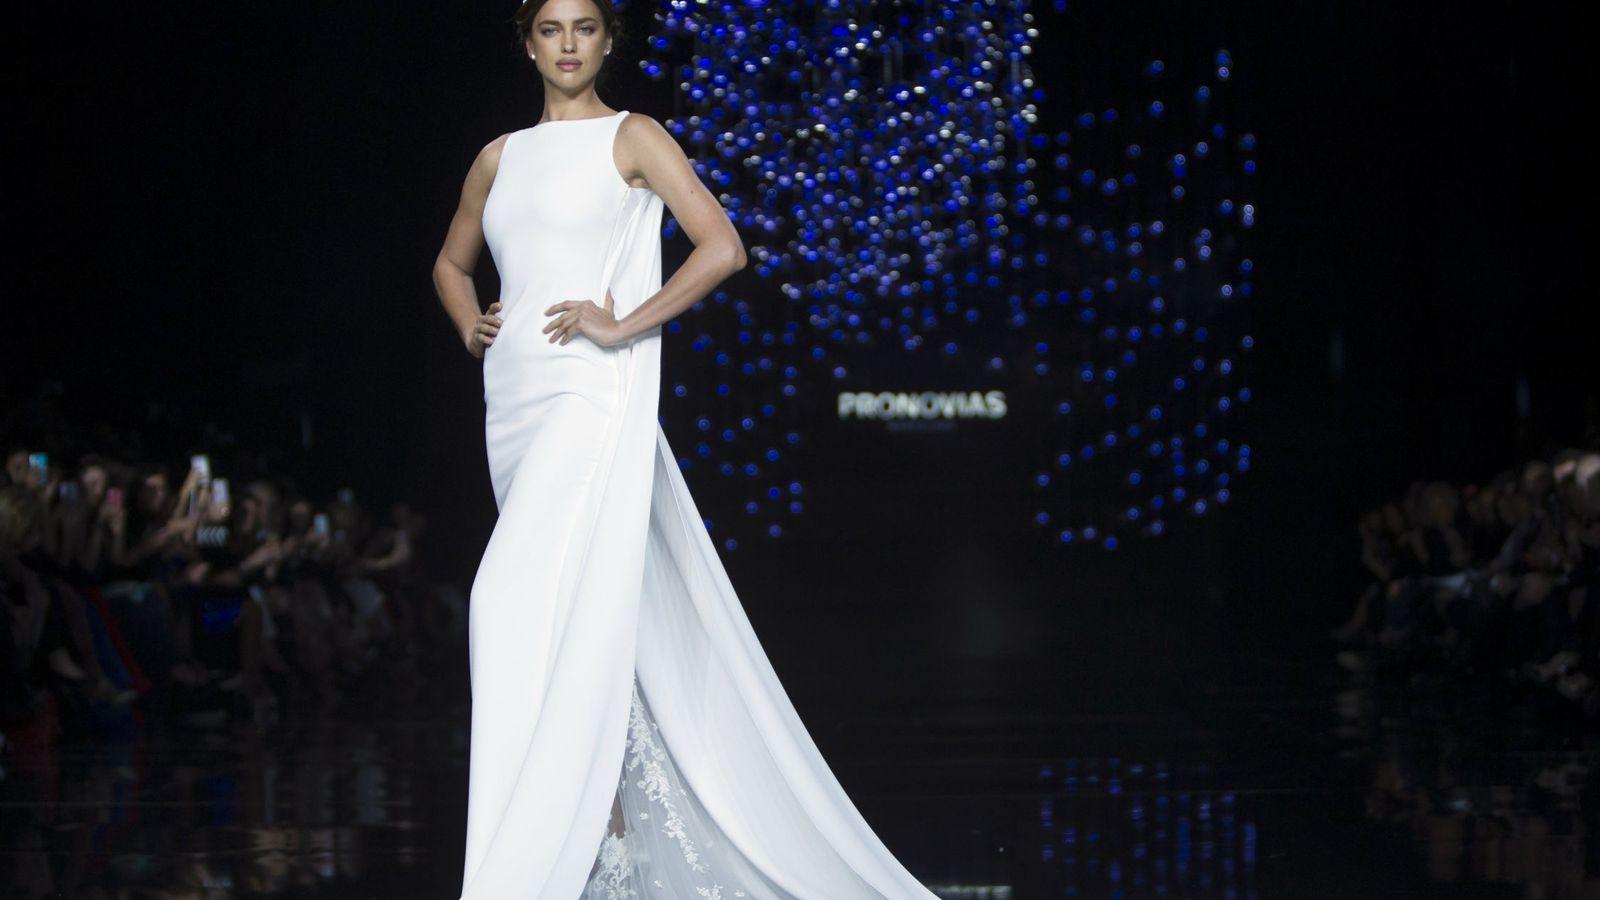 Foto: La modelo rusa Irina Shayk, durante el desfile de Pronovias en Barcelona. (EFE)